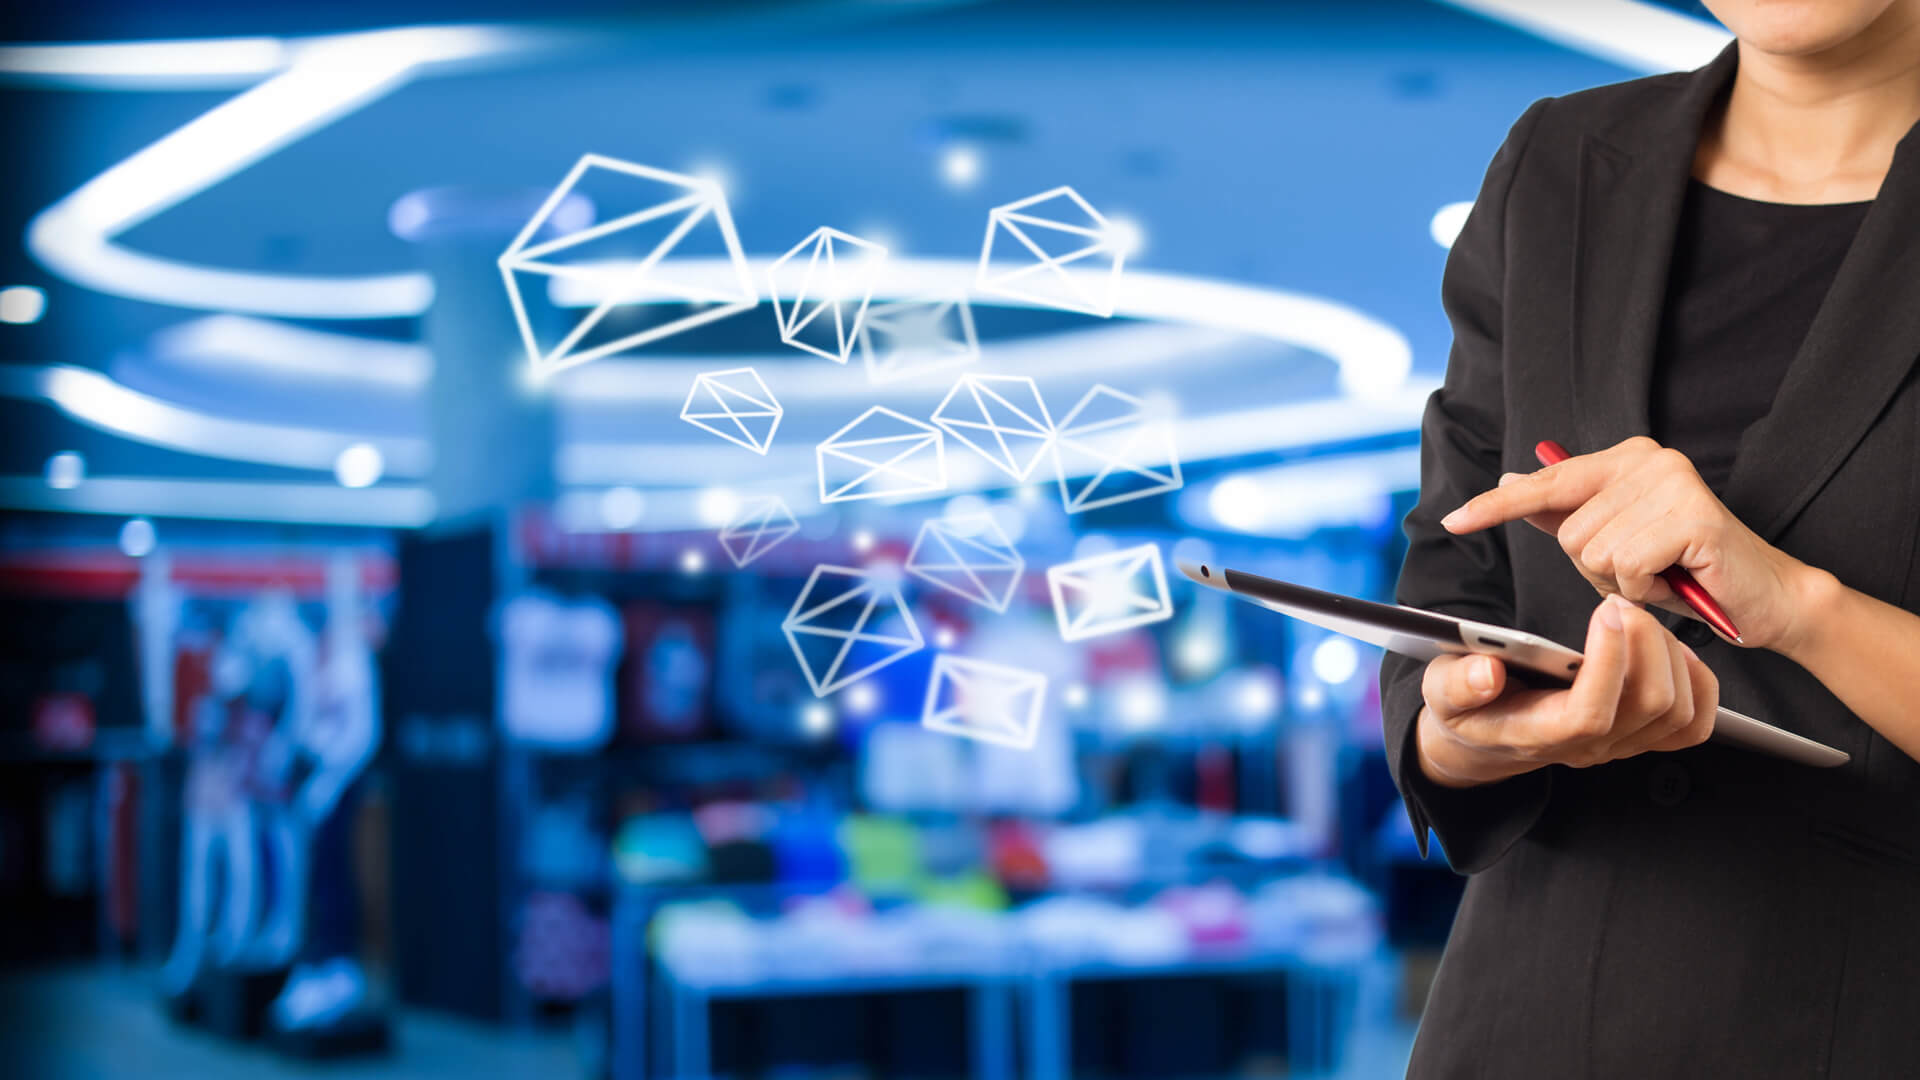 ingyenes-email-eszkoz